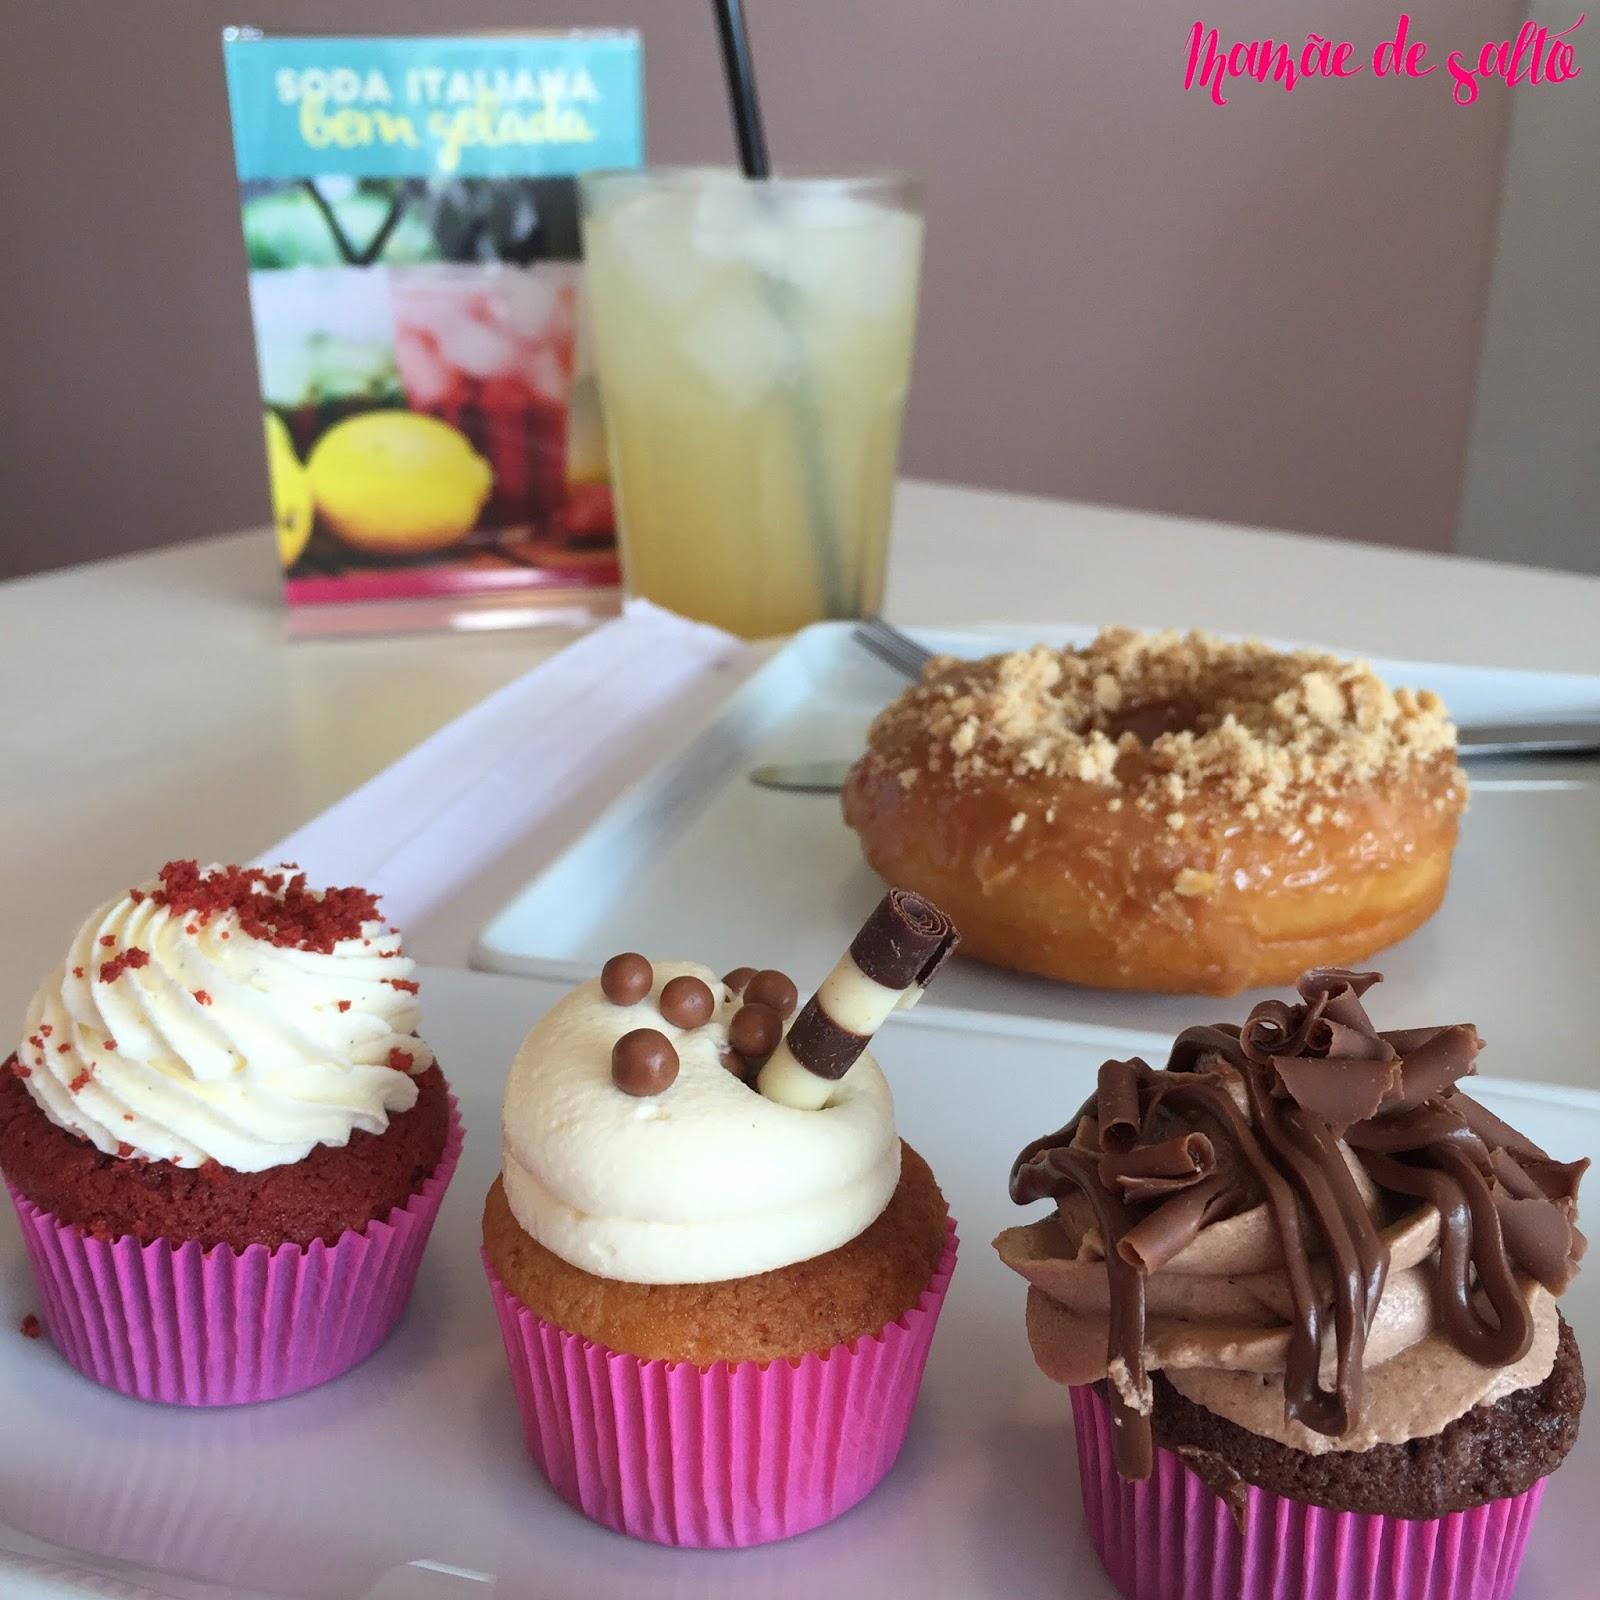 soda limonada, donuts doce de leite, cupcake chocolate branco, nutella, red velvet Sugar Bakery Curitiba/PR ... blog Mamãe de Salto